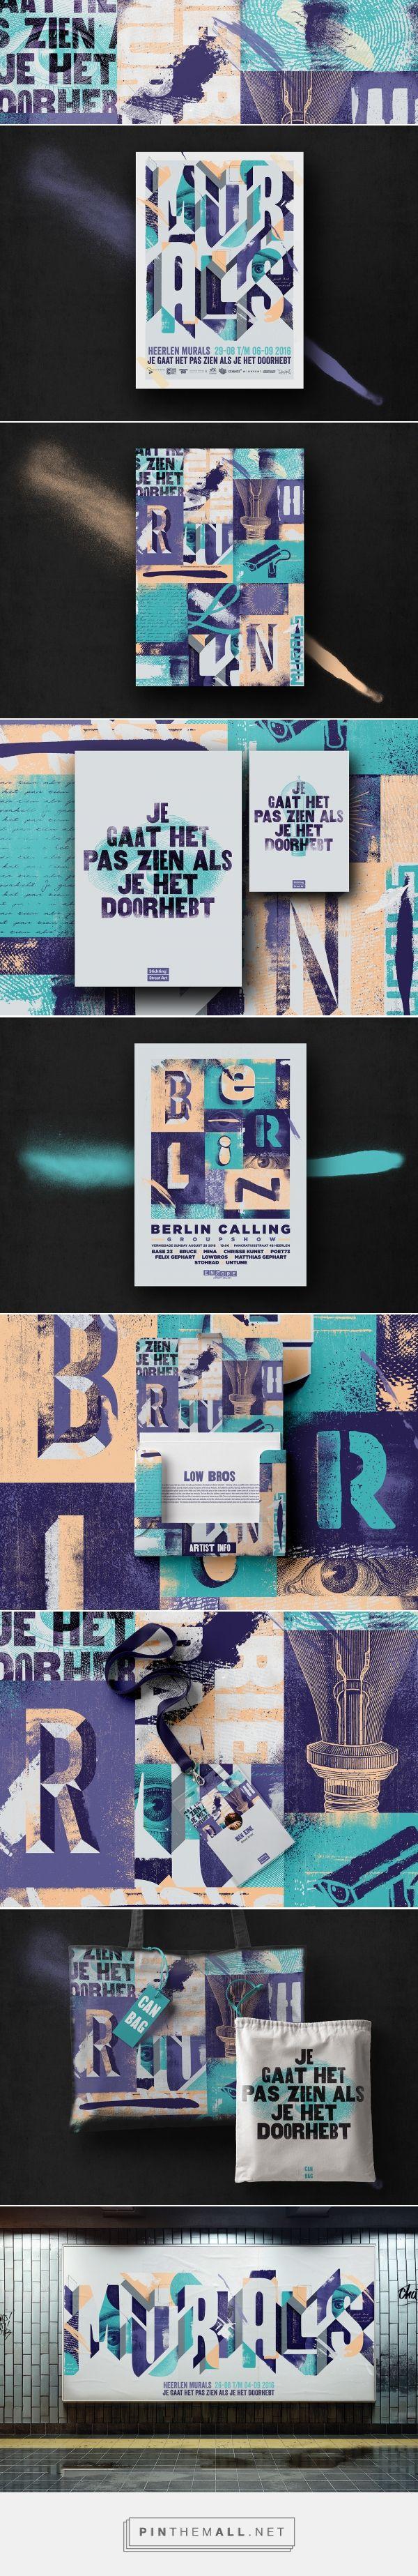 Heerlen Mural Street Art Festival Branding by Fabian De Lange   Fivestar Branding – Design and Branding Agency & Inspiration Gallery   #DesignInspiration